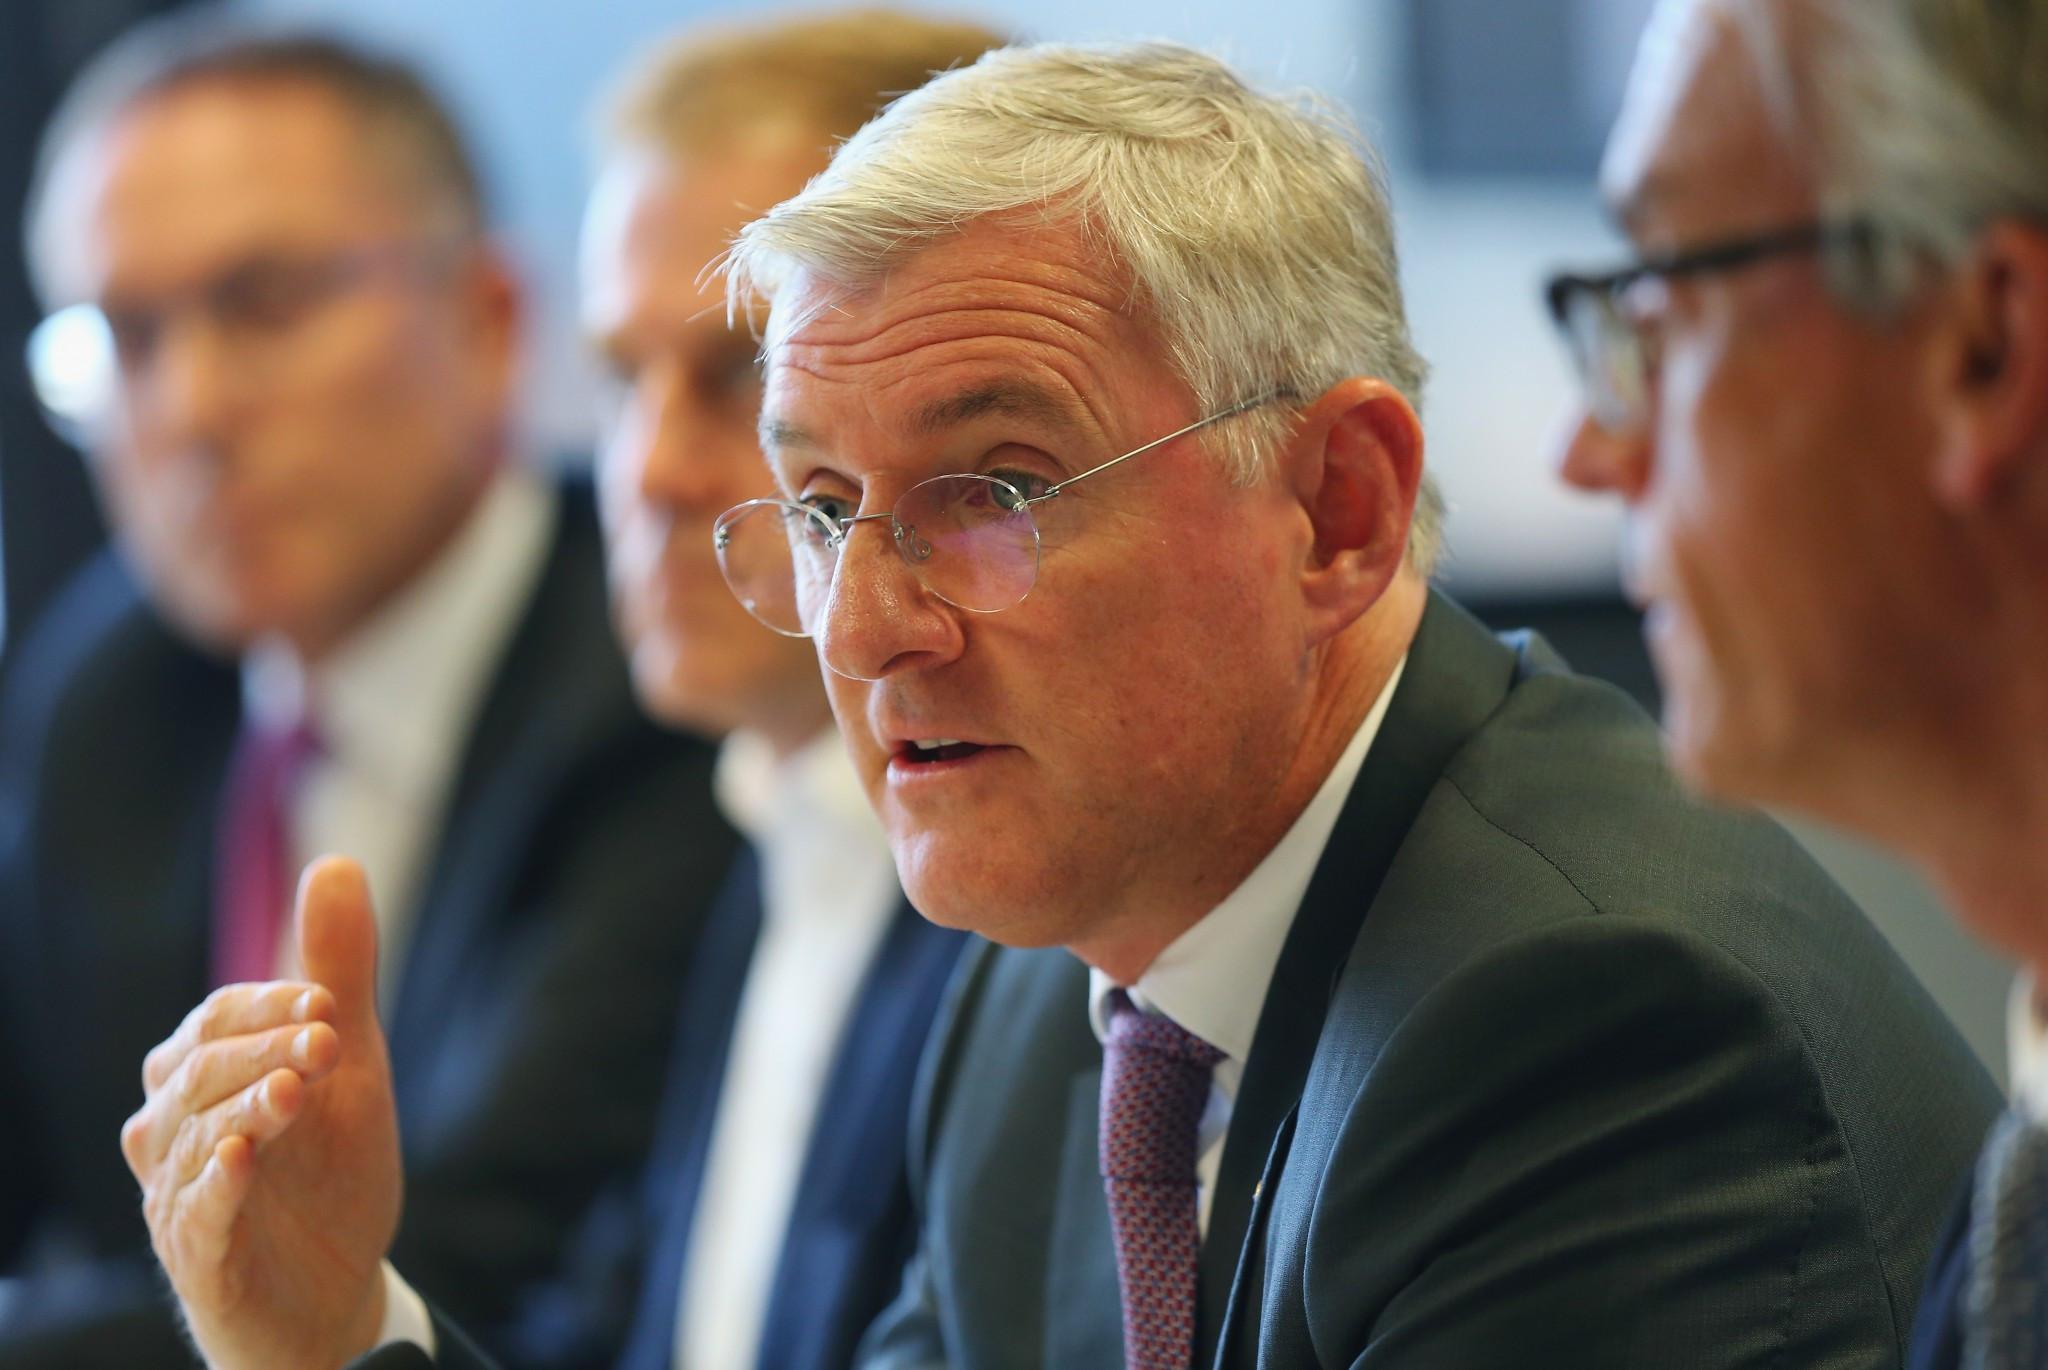 FIFA and AFC delegation visit Australia for crisis talks over governance row